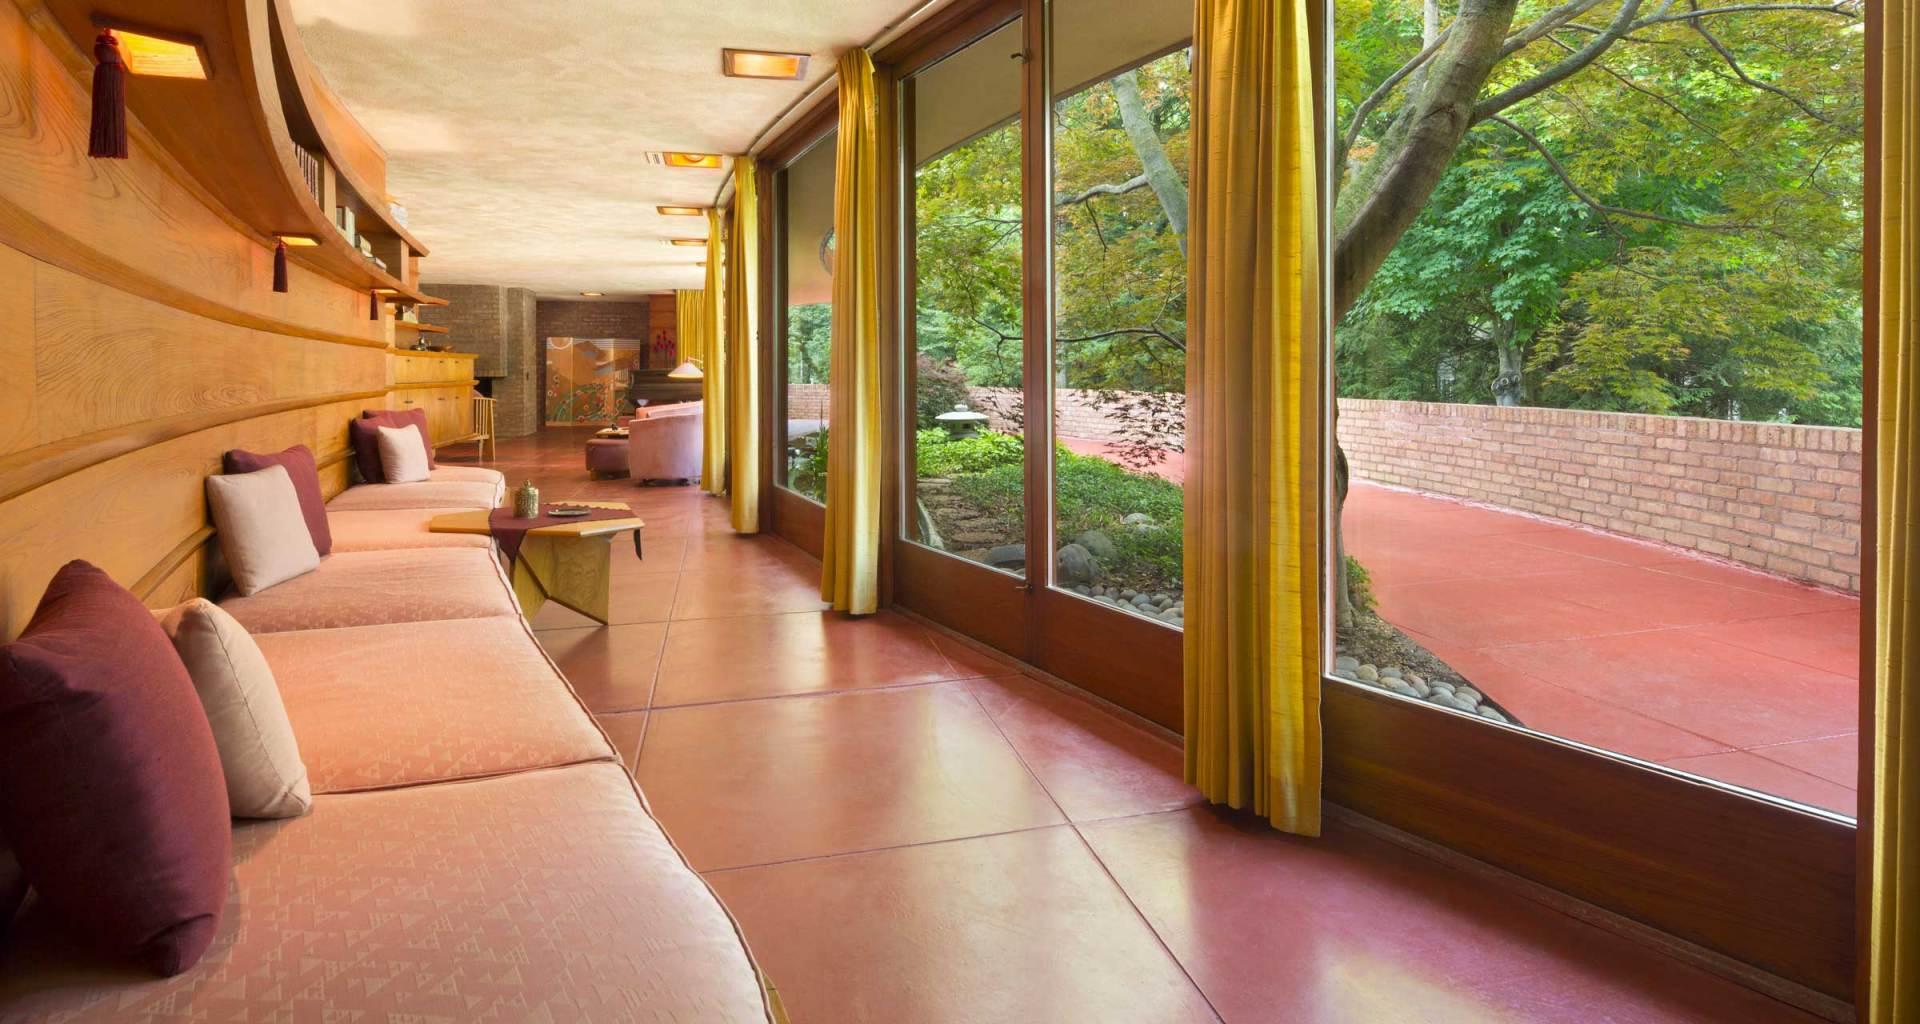 Interior corridor of Frank Lloyd Wright's Laurent House.